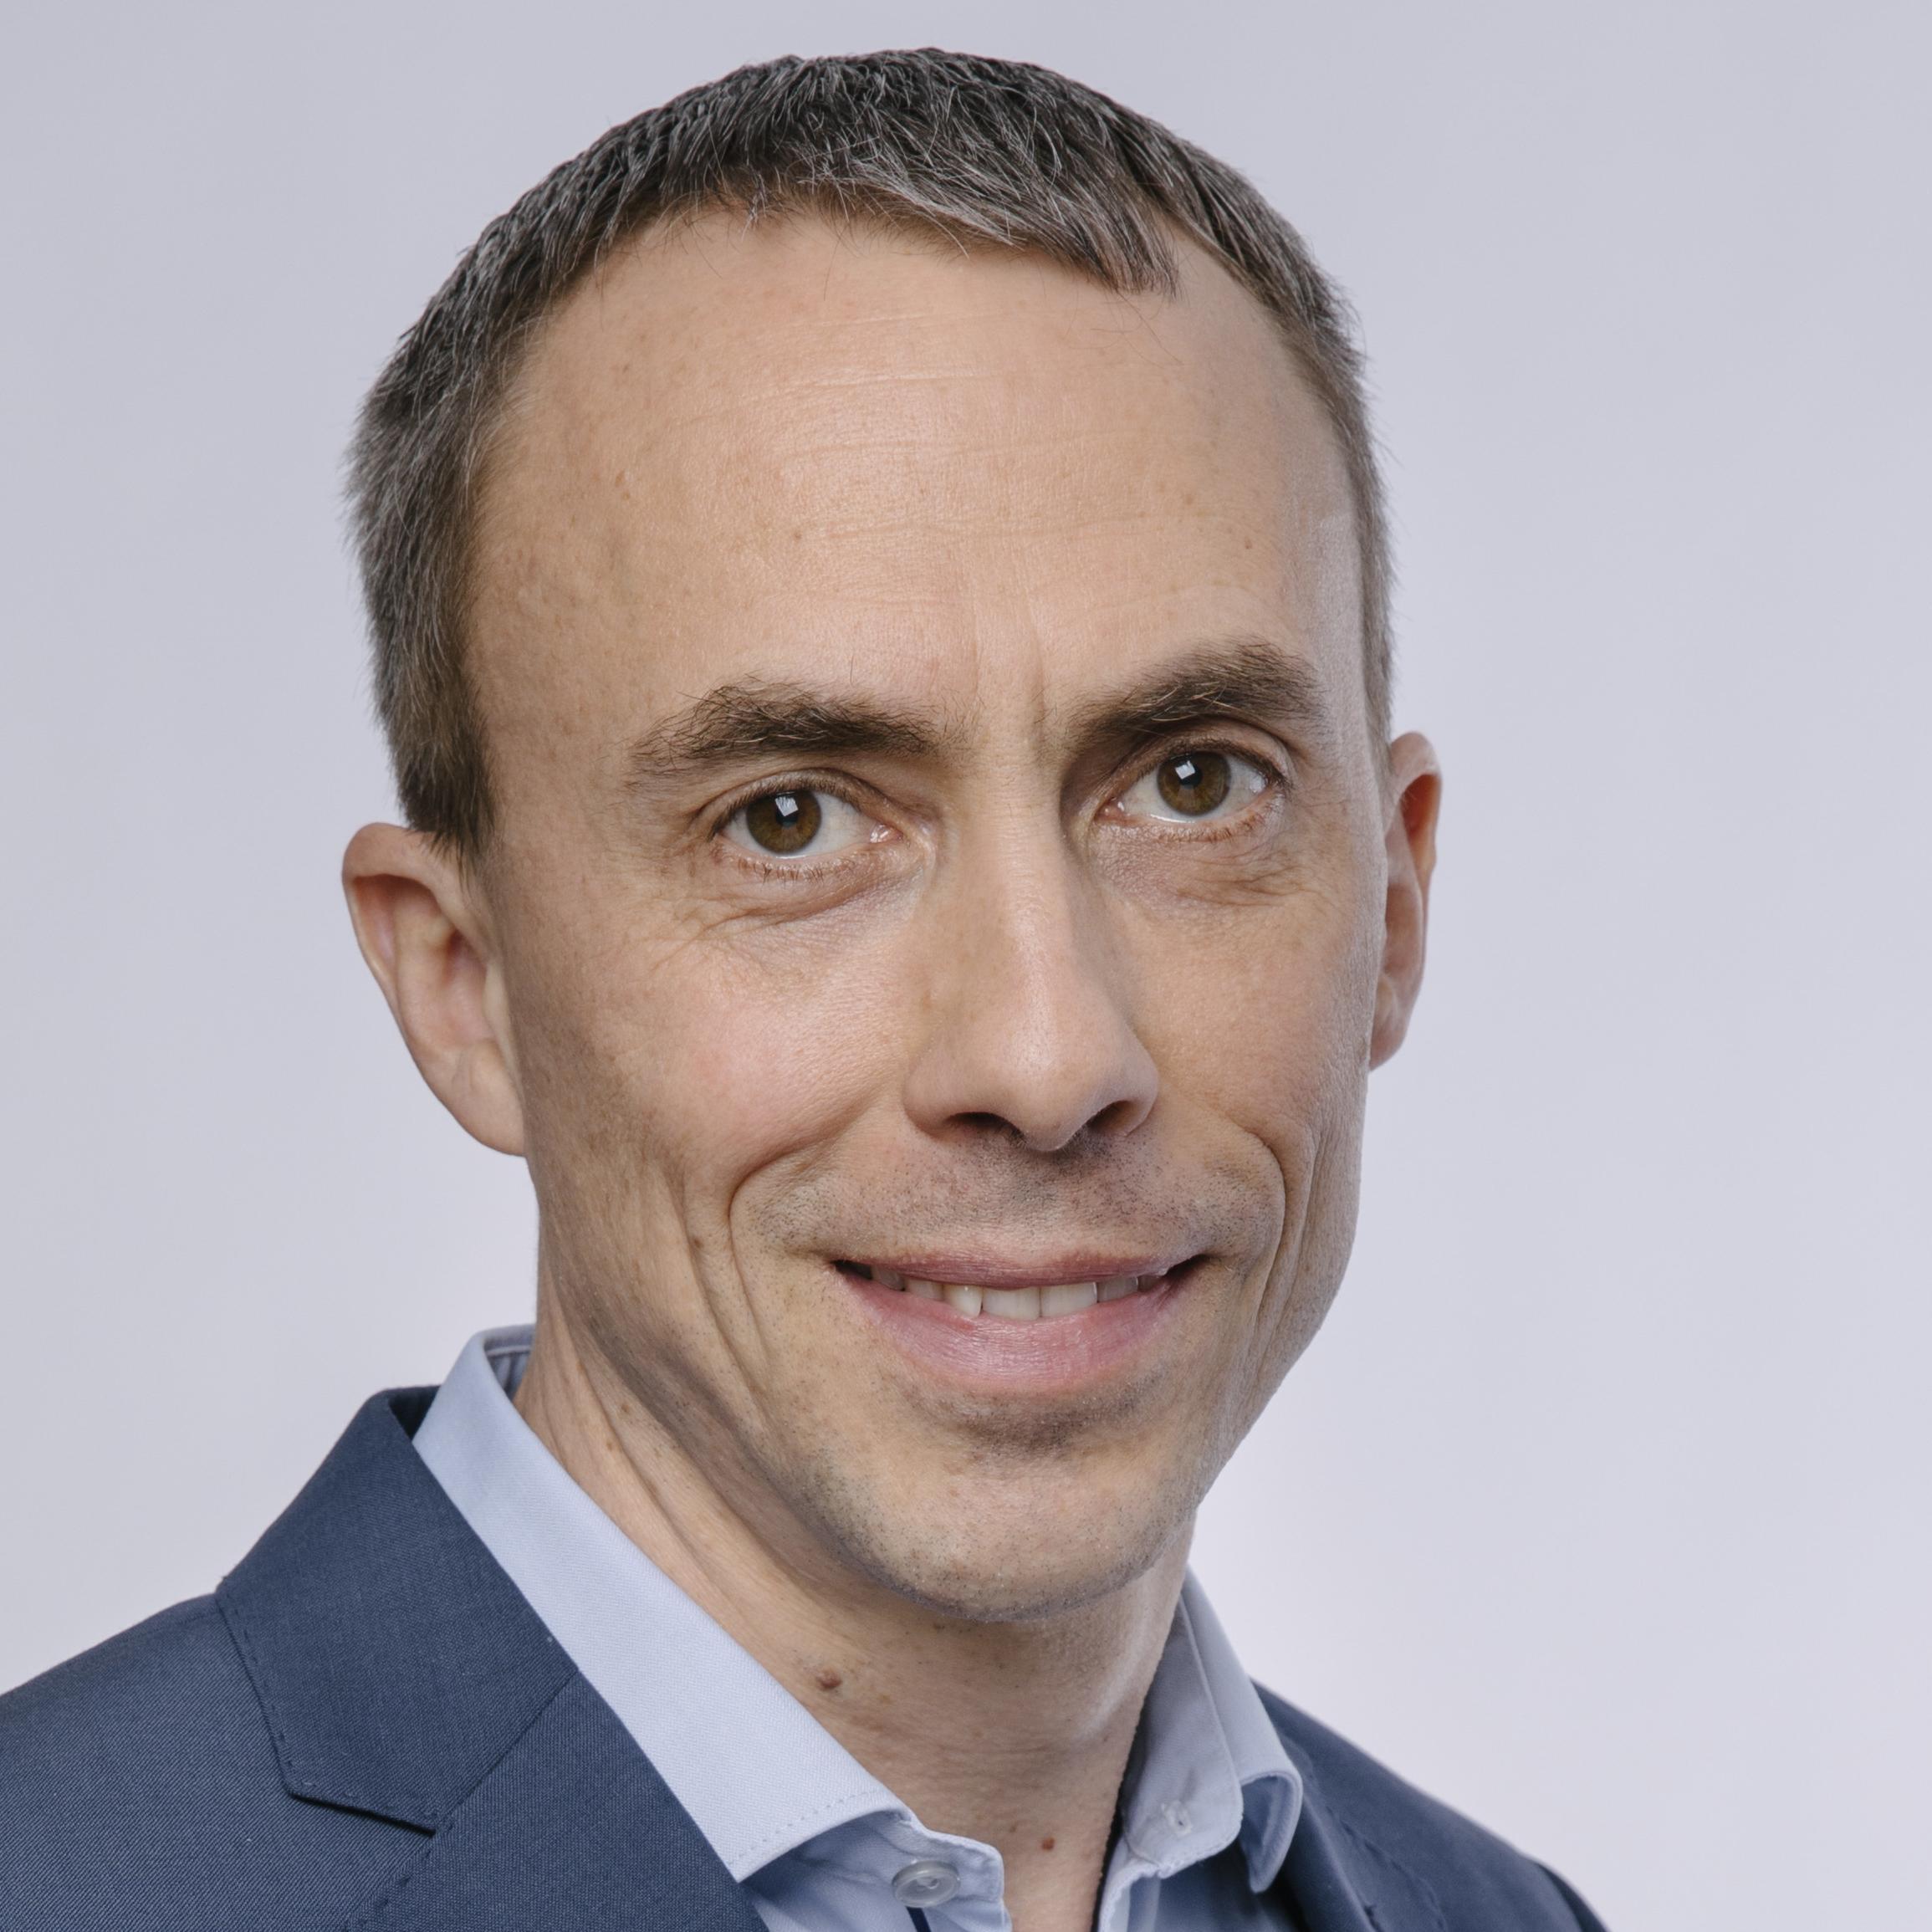 Carlo Schindhelm